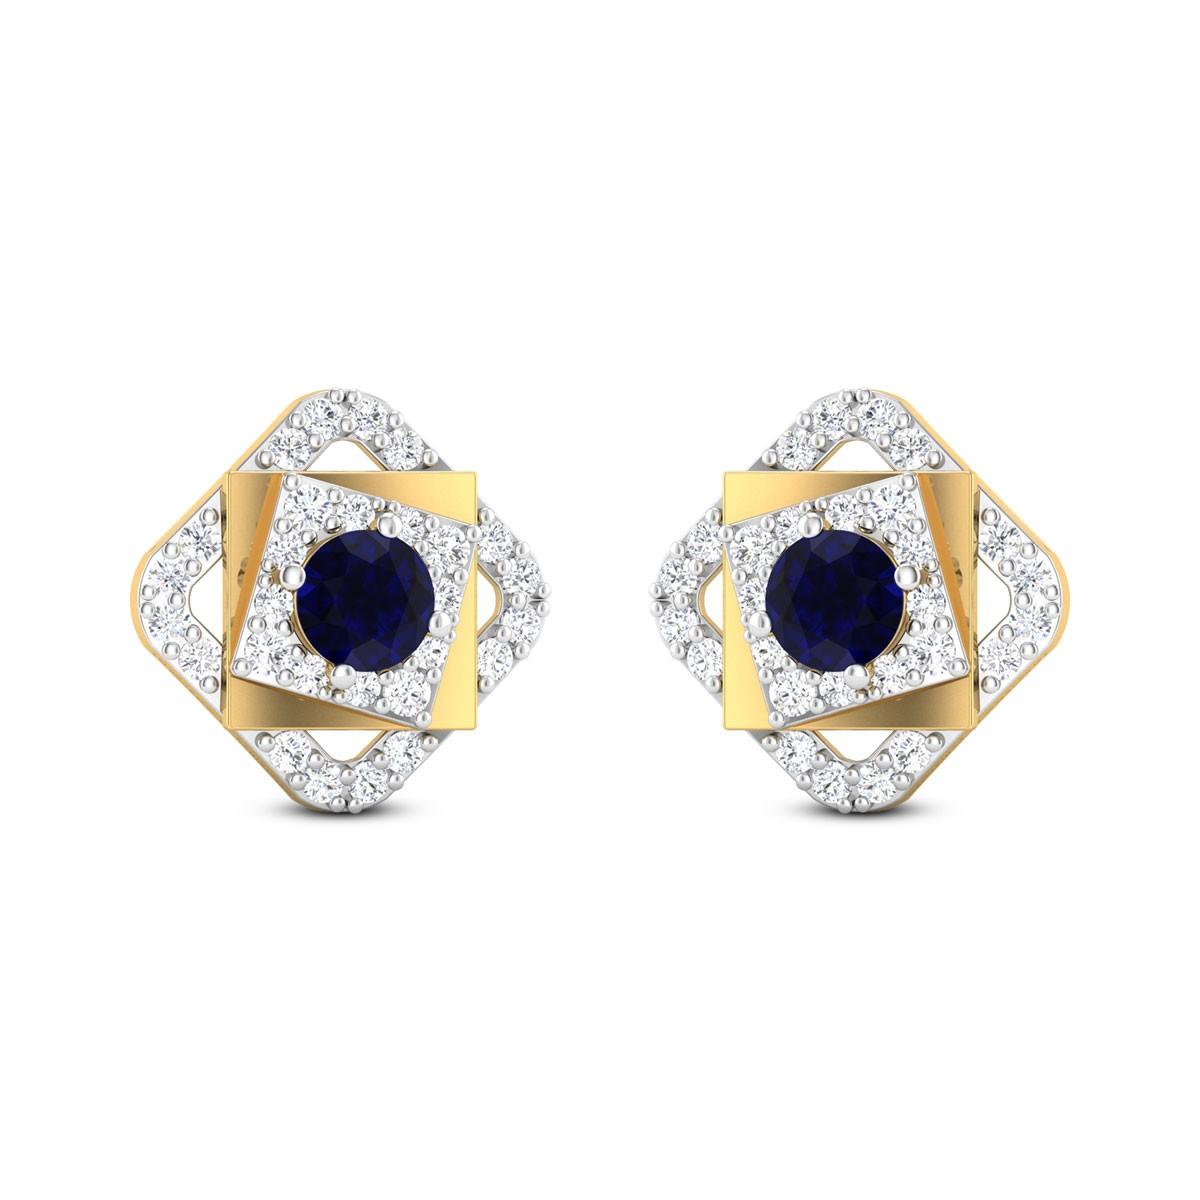 Tri Square Sapphire Stud Earrings